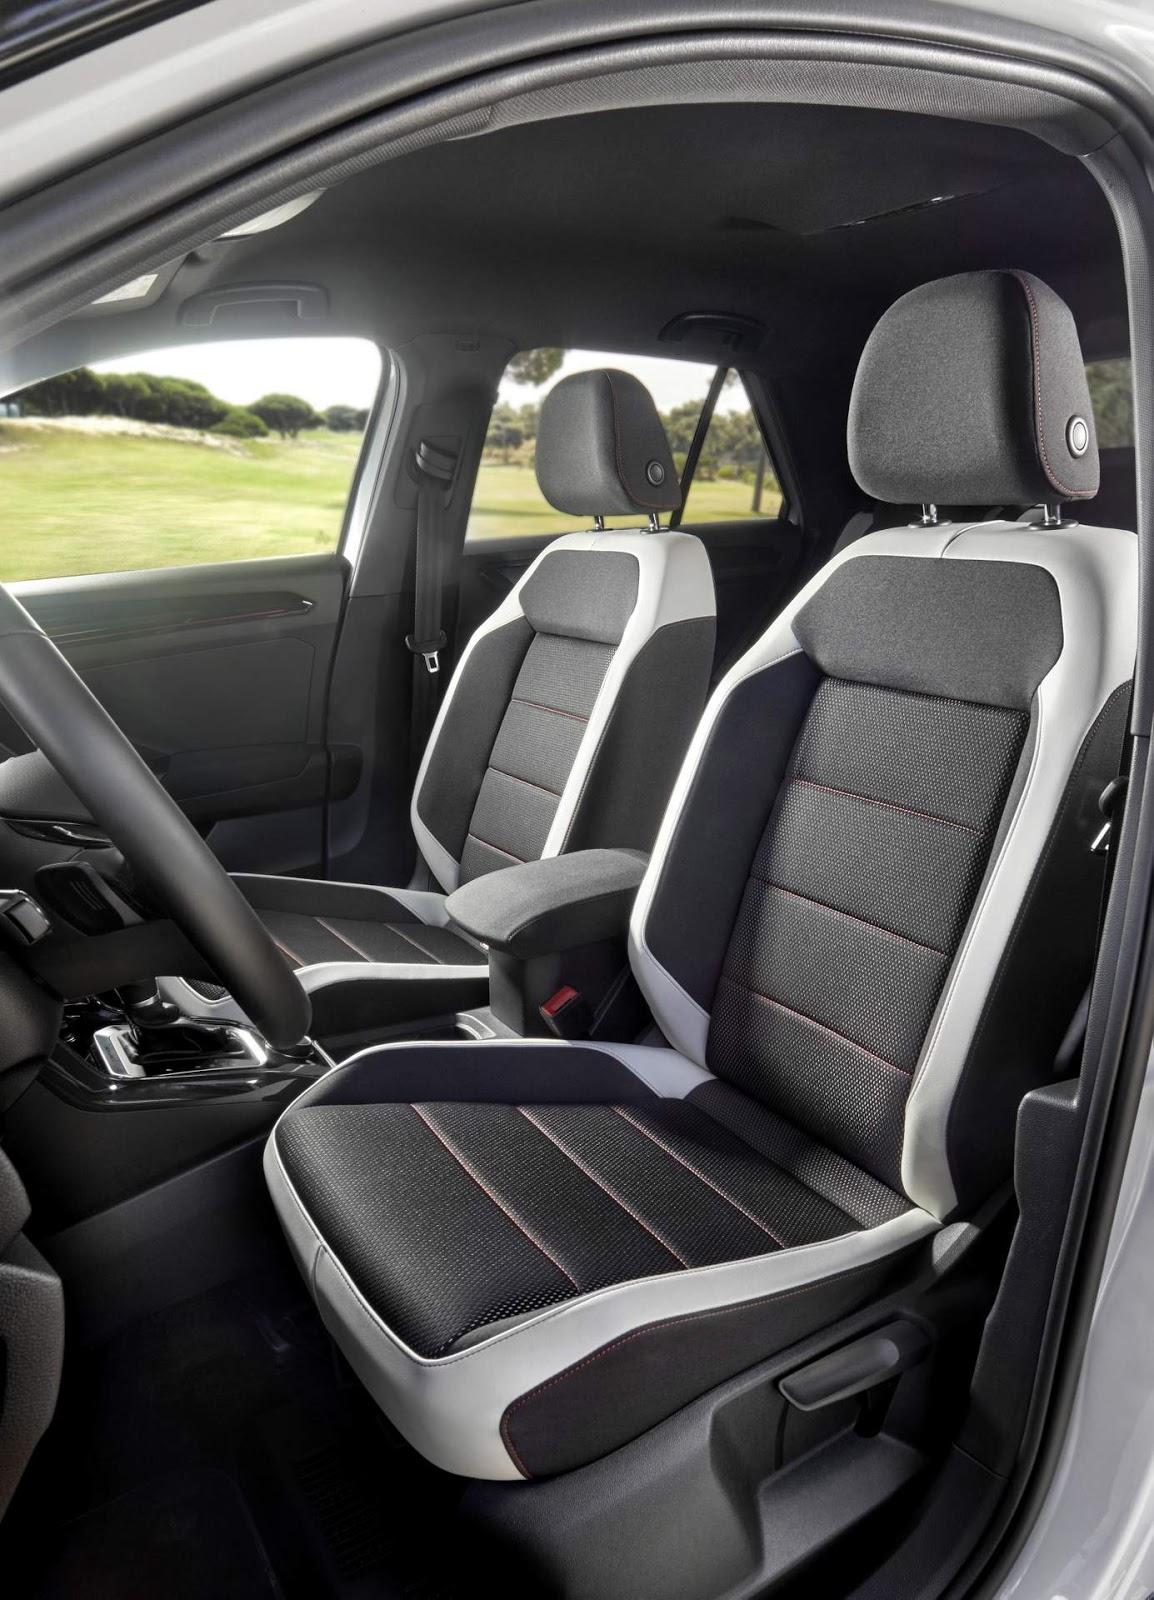 Volkswagen T Roc Suv Referencial Em Design E Din Mica